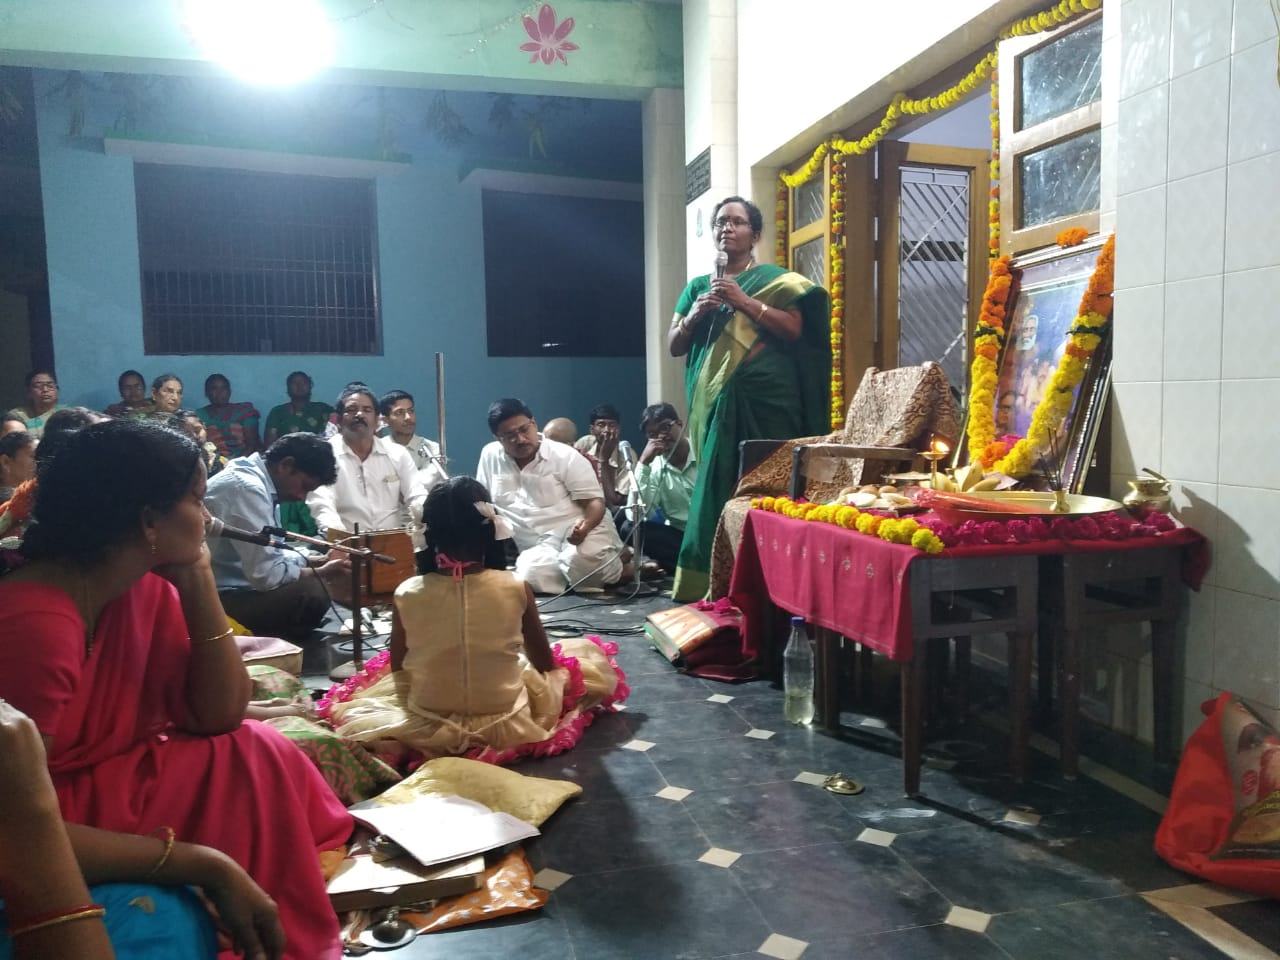 07-KarthikaMasam-Aaradhana-Aacchampeta-27112019